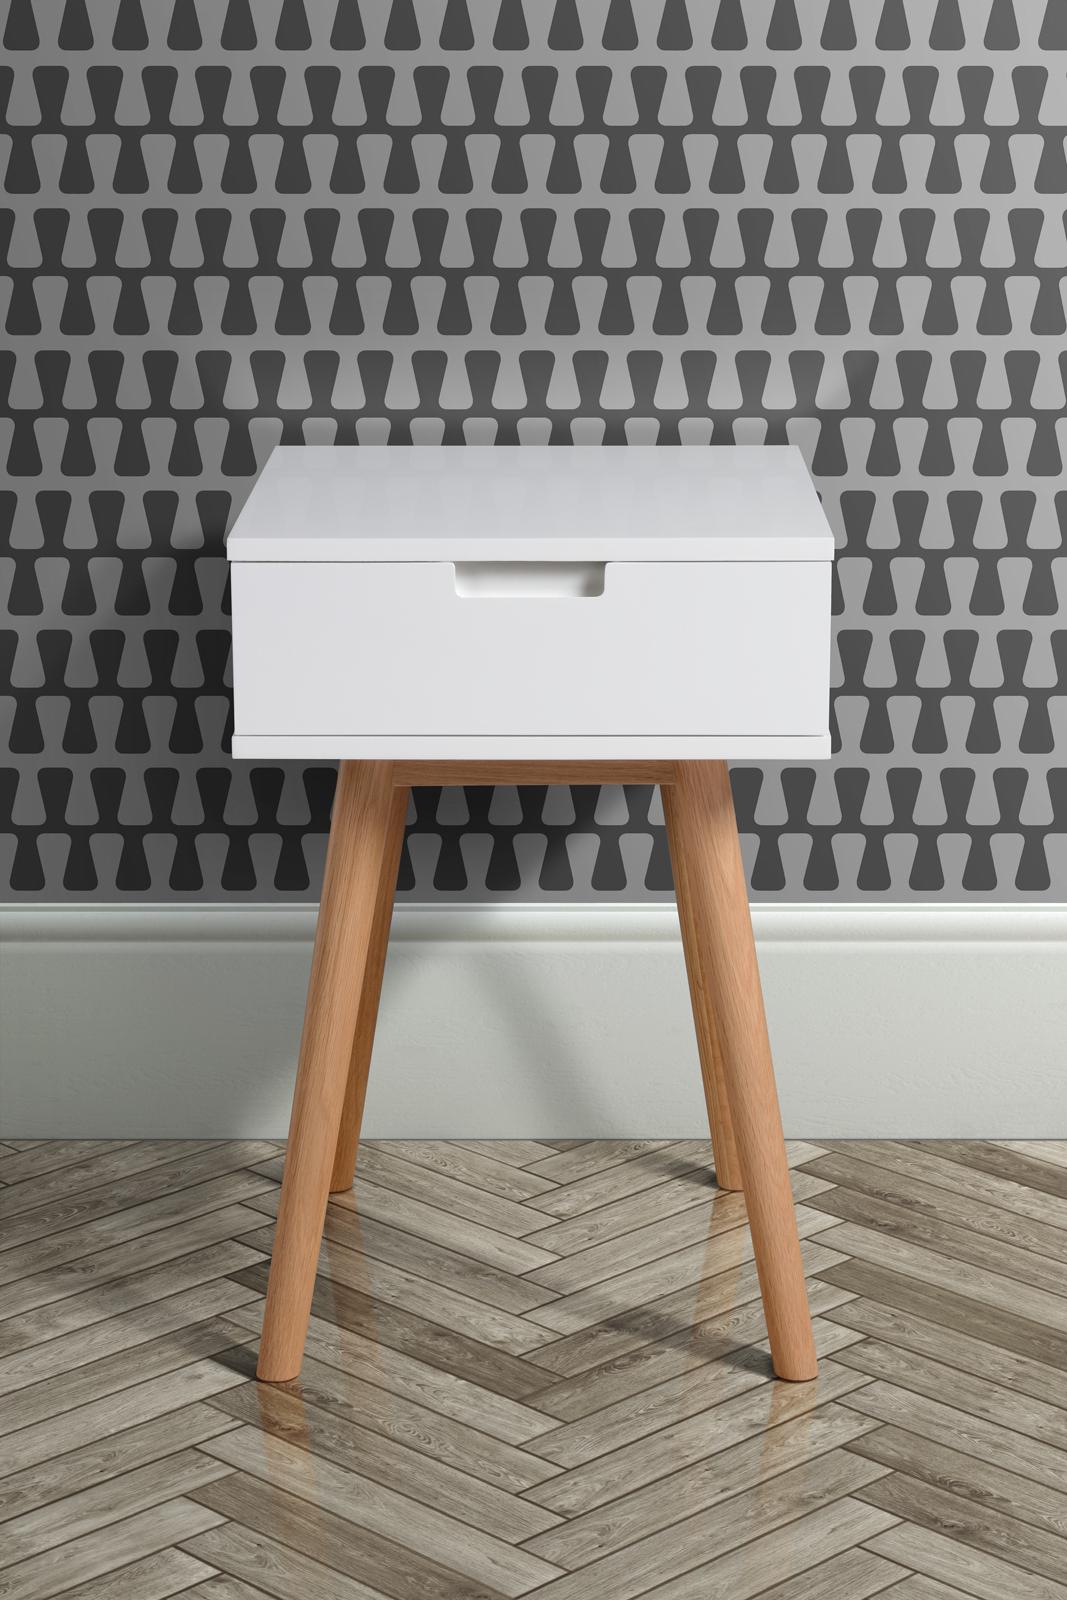 obr.10_my-furniture_tretton-bedside-table-.jpg